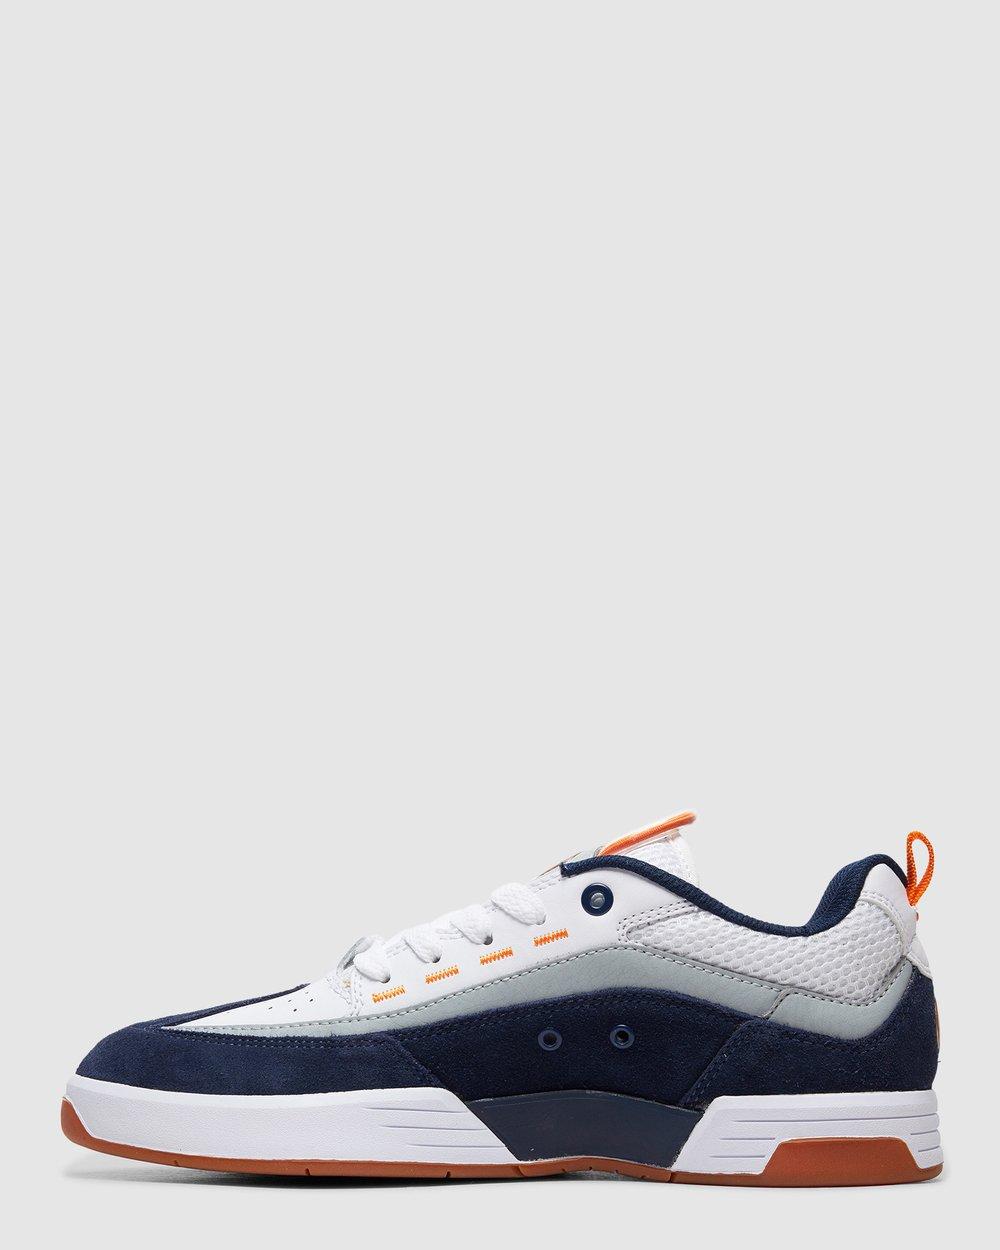 7d16b55724a4 Mens Legacy 98 Slim Shoes by DC Shoes Online | THE ICONIC | Australia